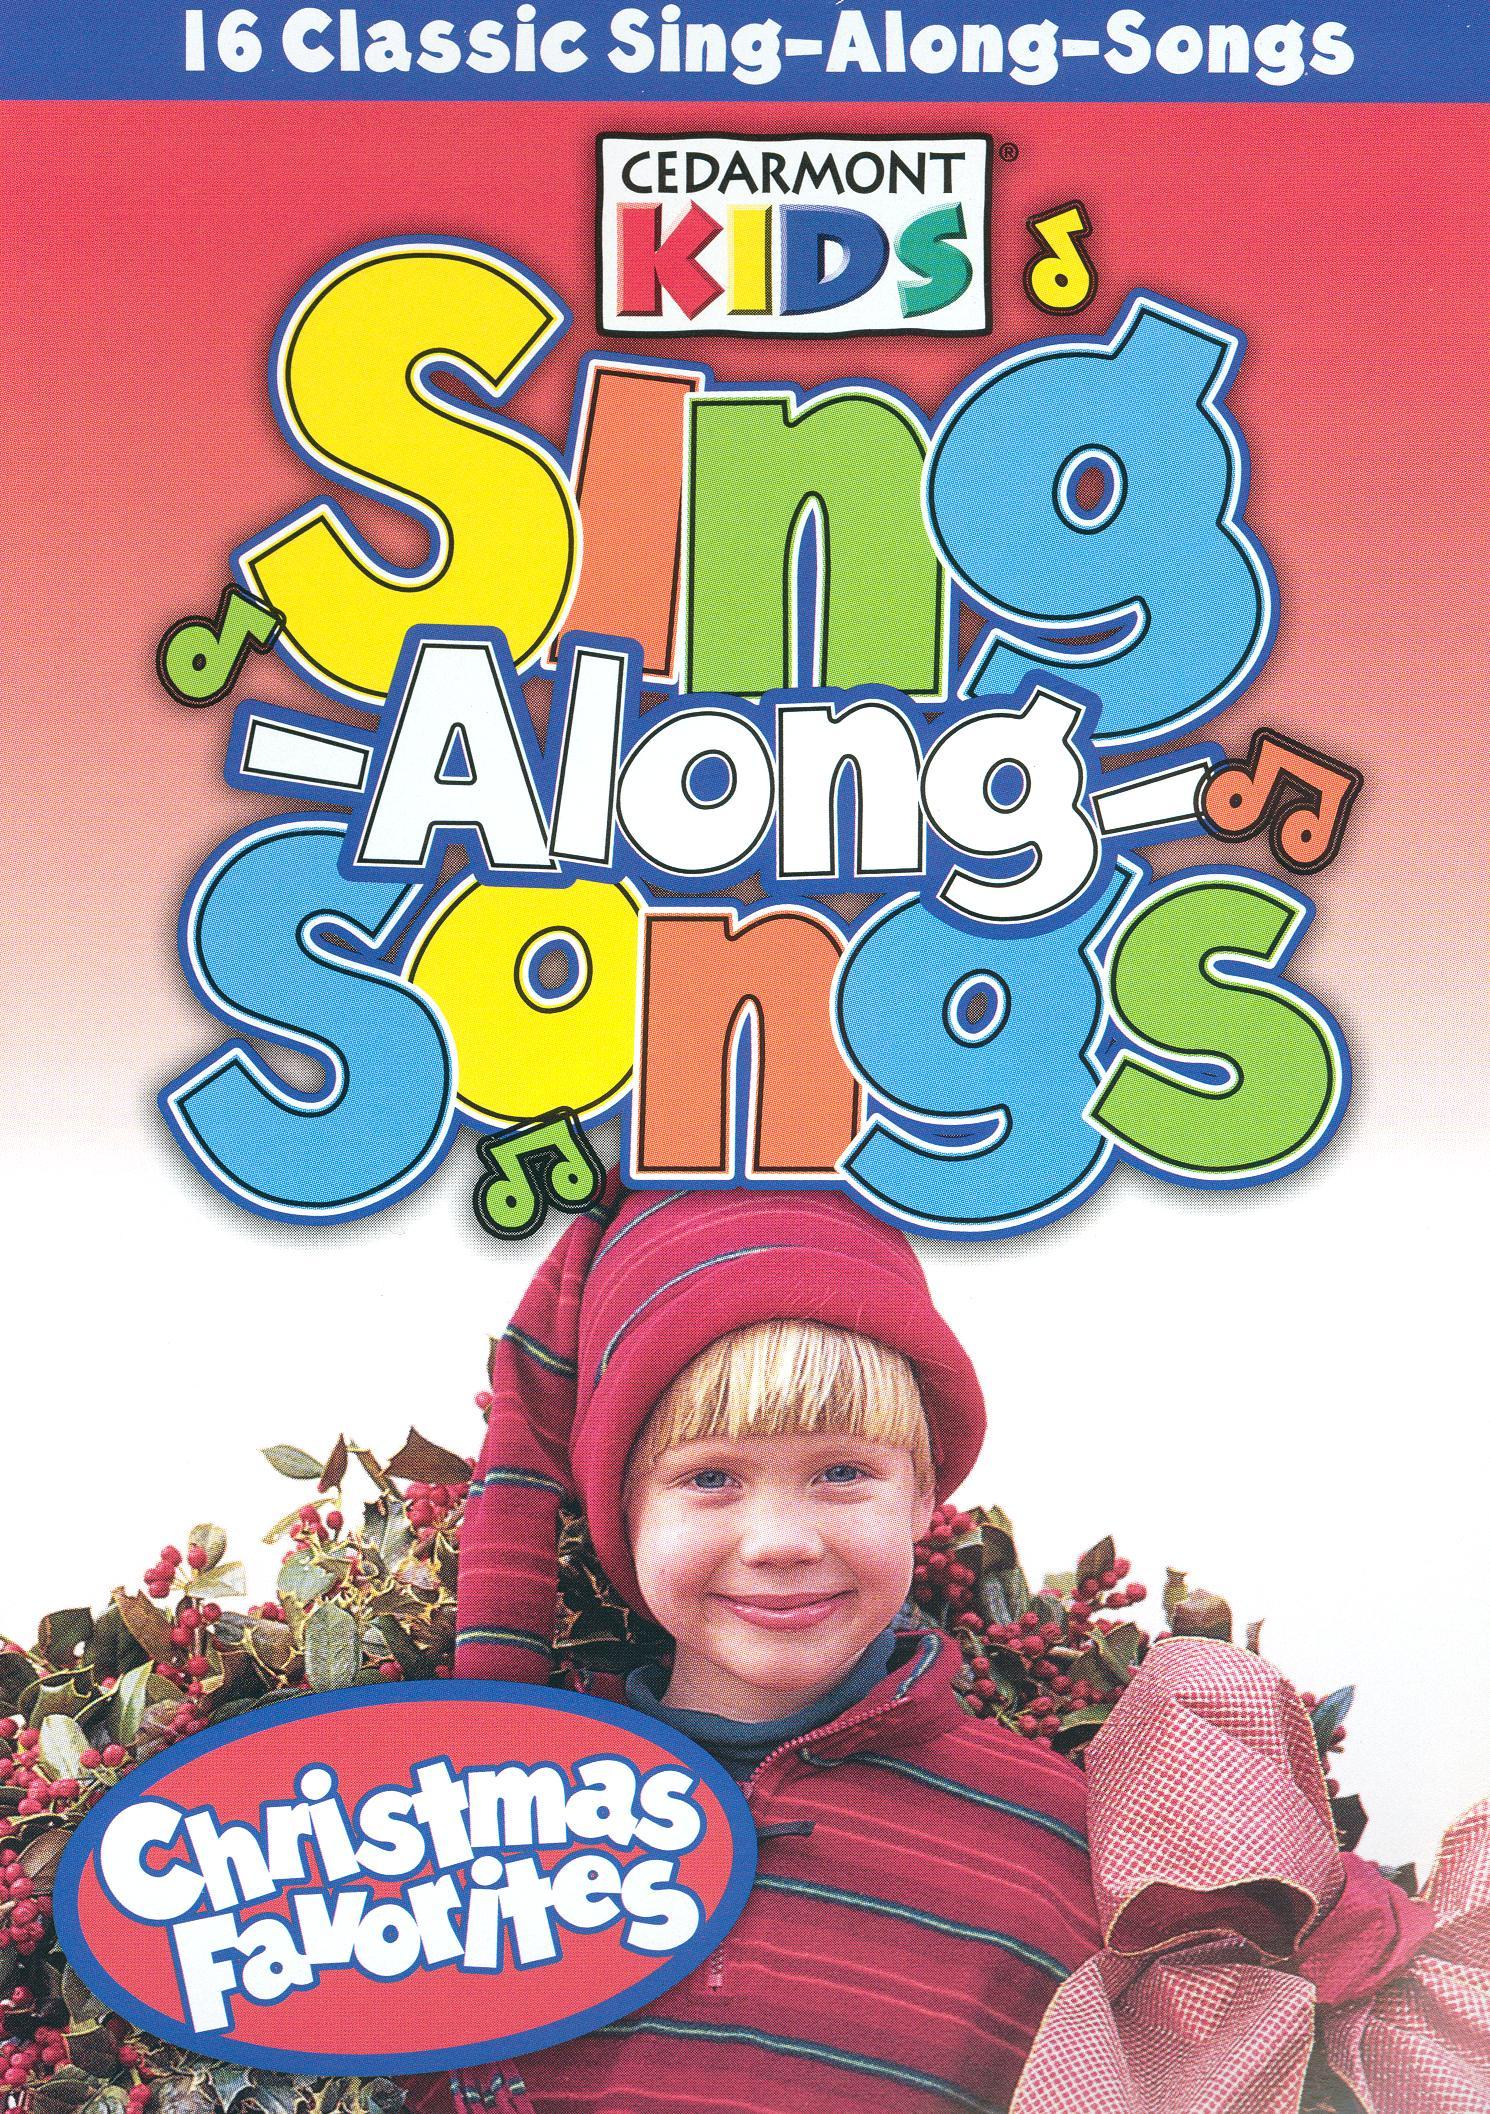 cedarmont kids sing along songs christmas favorites - Classic Christmas Favorites